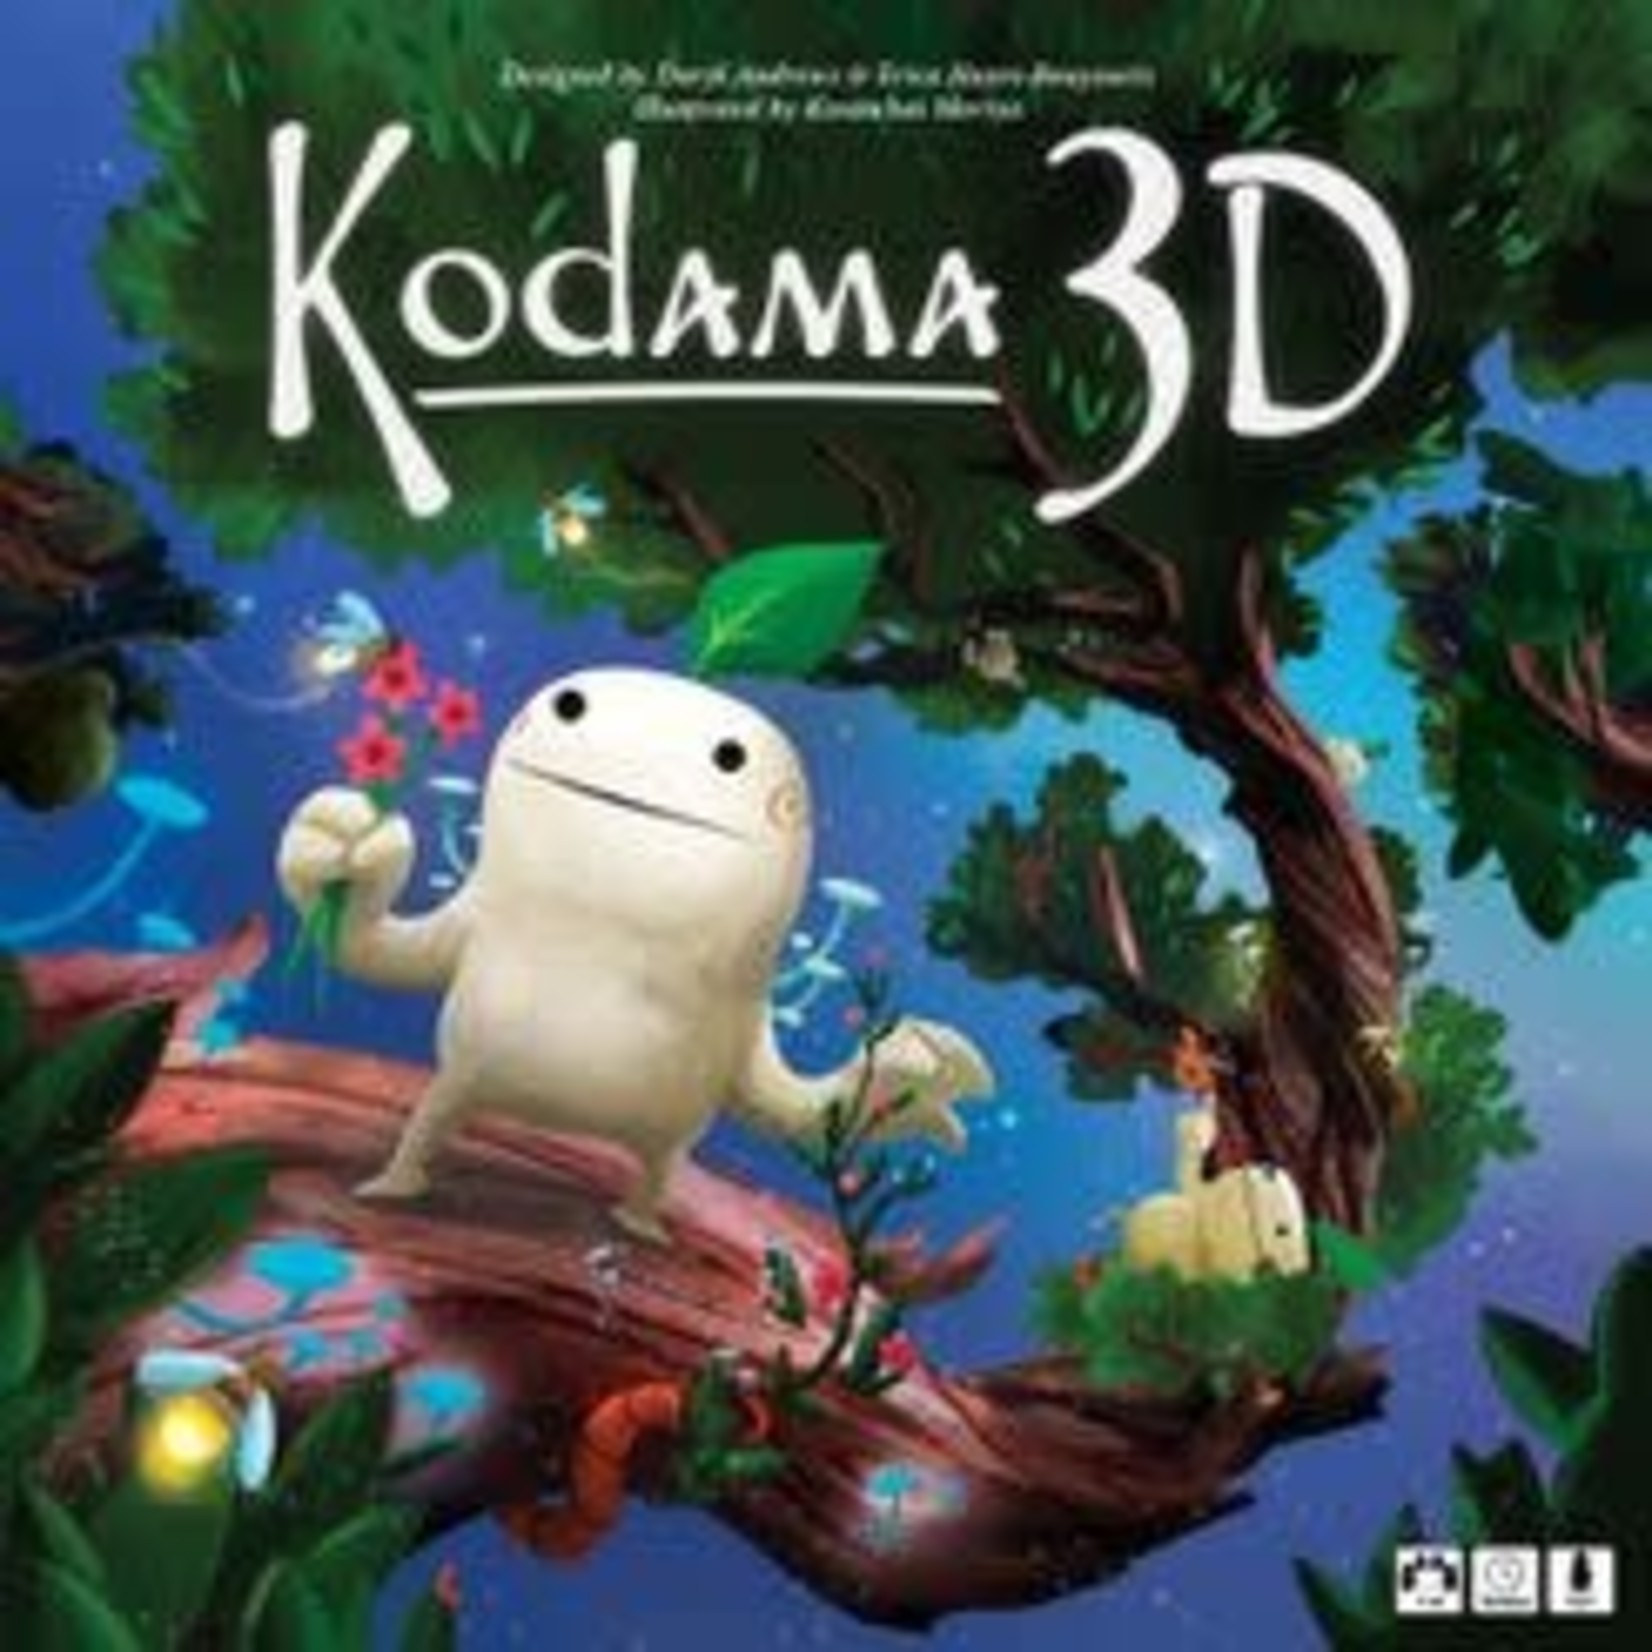 Kodama 3D Board Game